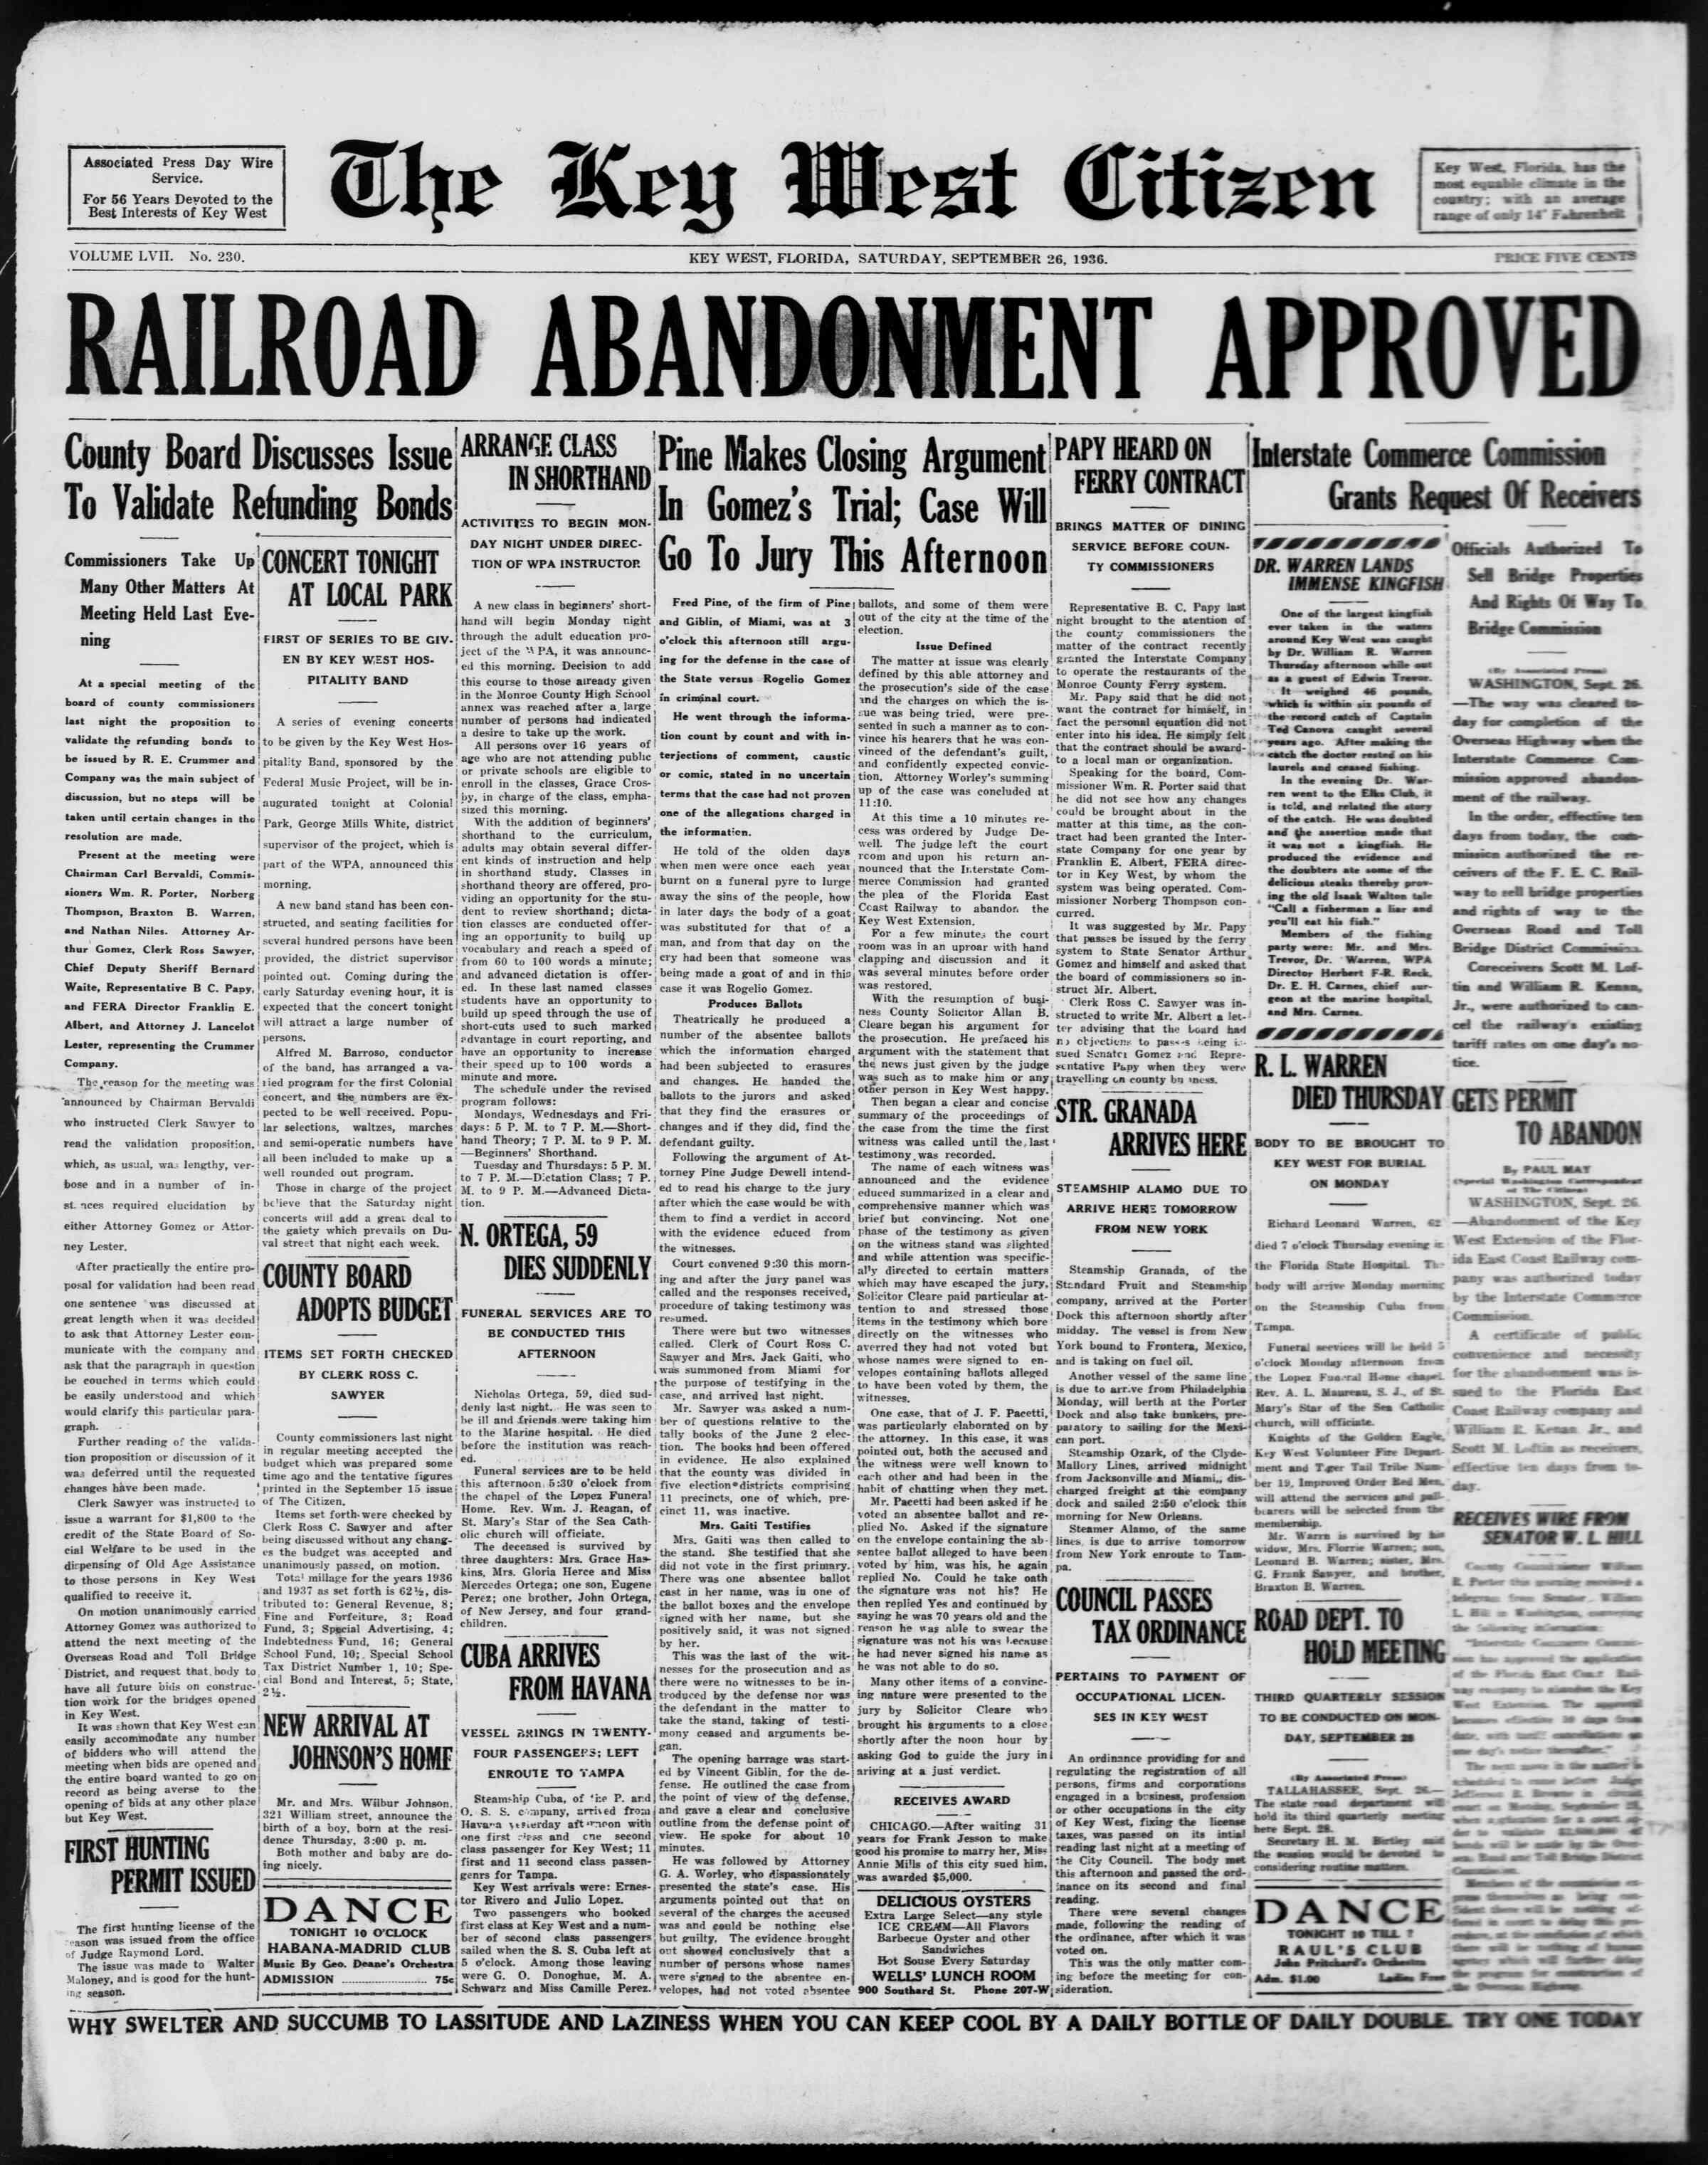 26 Eylül 1936 Tarihli The Key West Citizen Gazetesi Sayfa 1